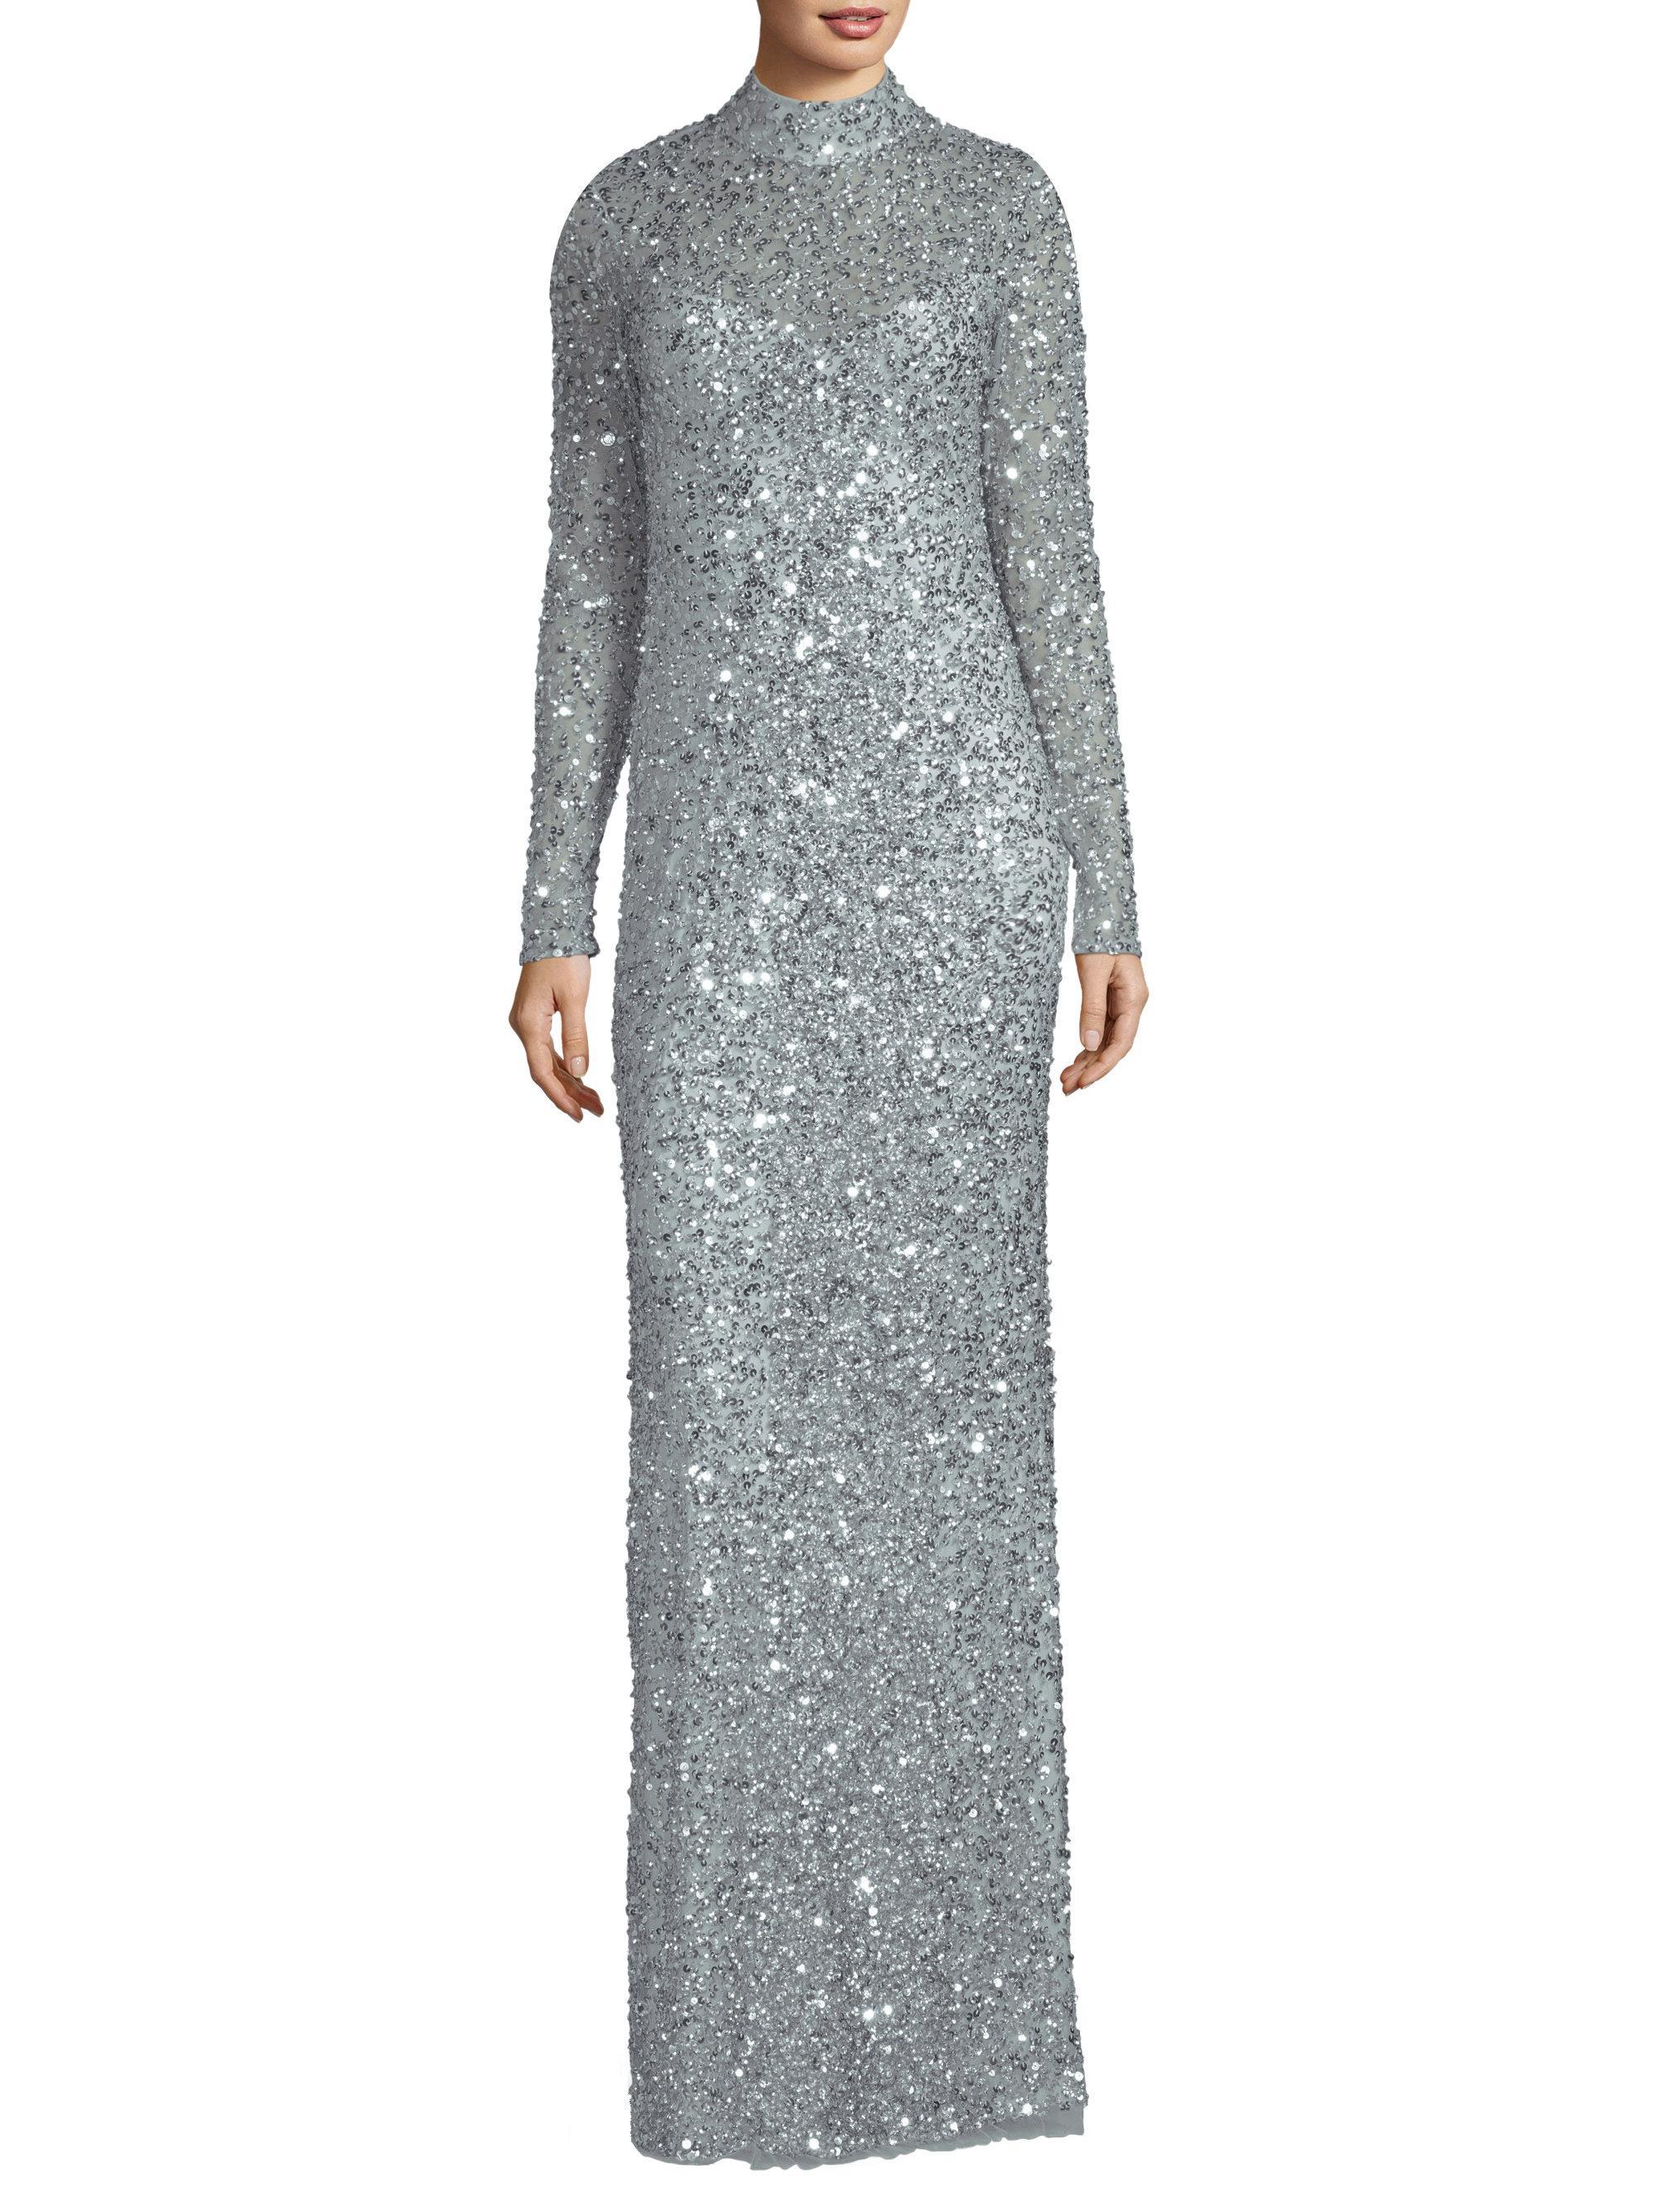 Lyst - Parker Black Leandra Sequin Dress in Gray